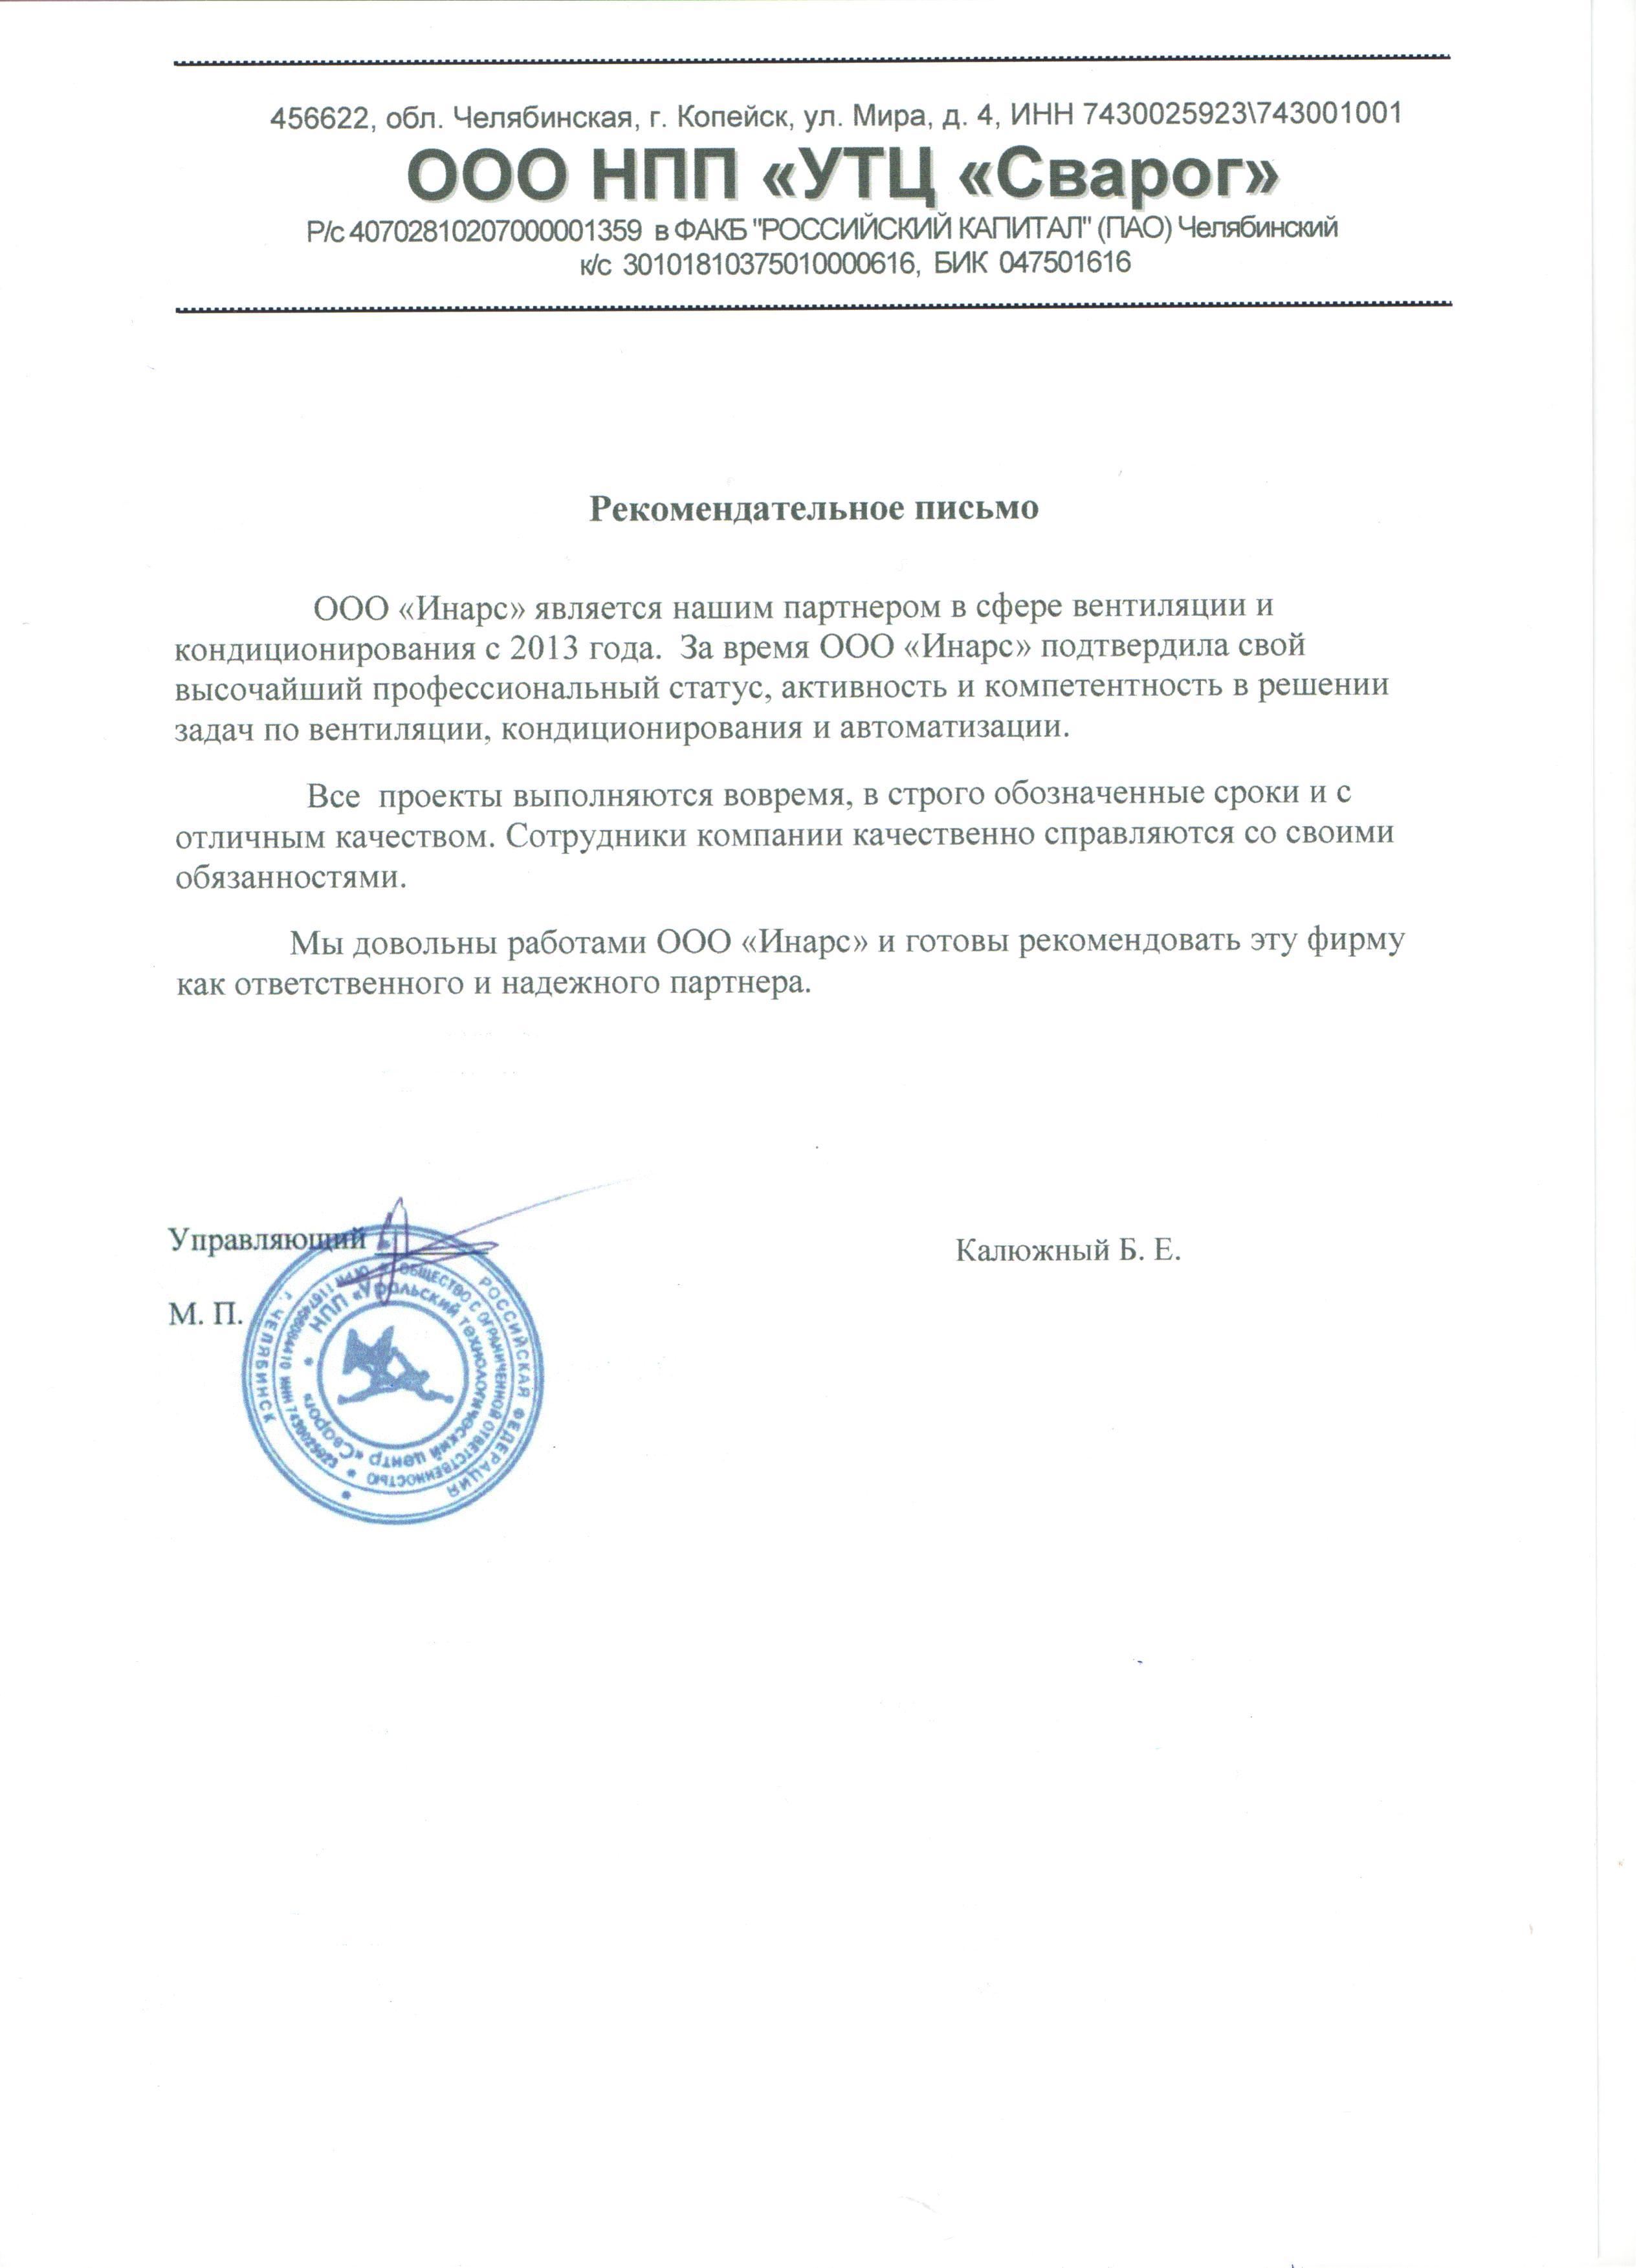 НПЦ Сварог